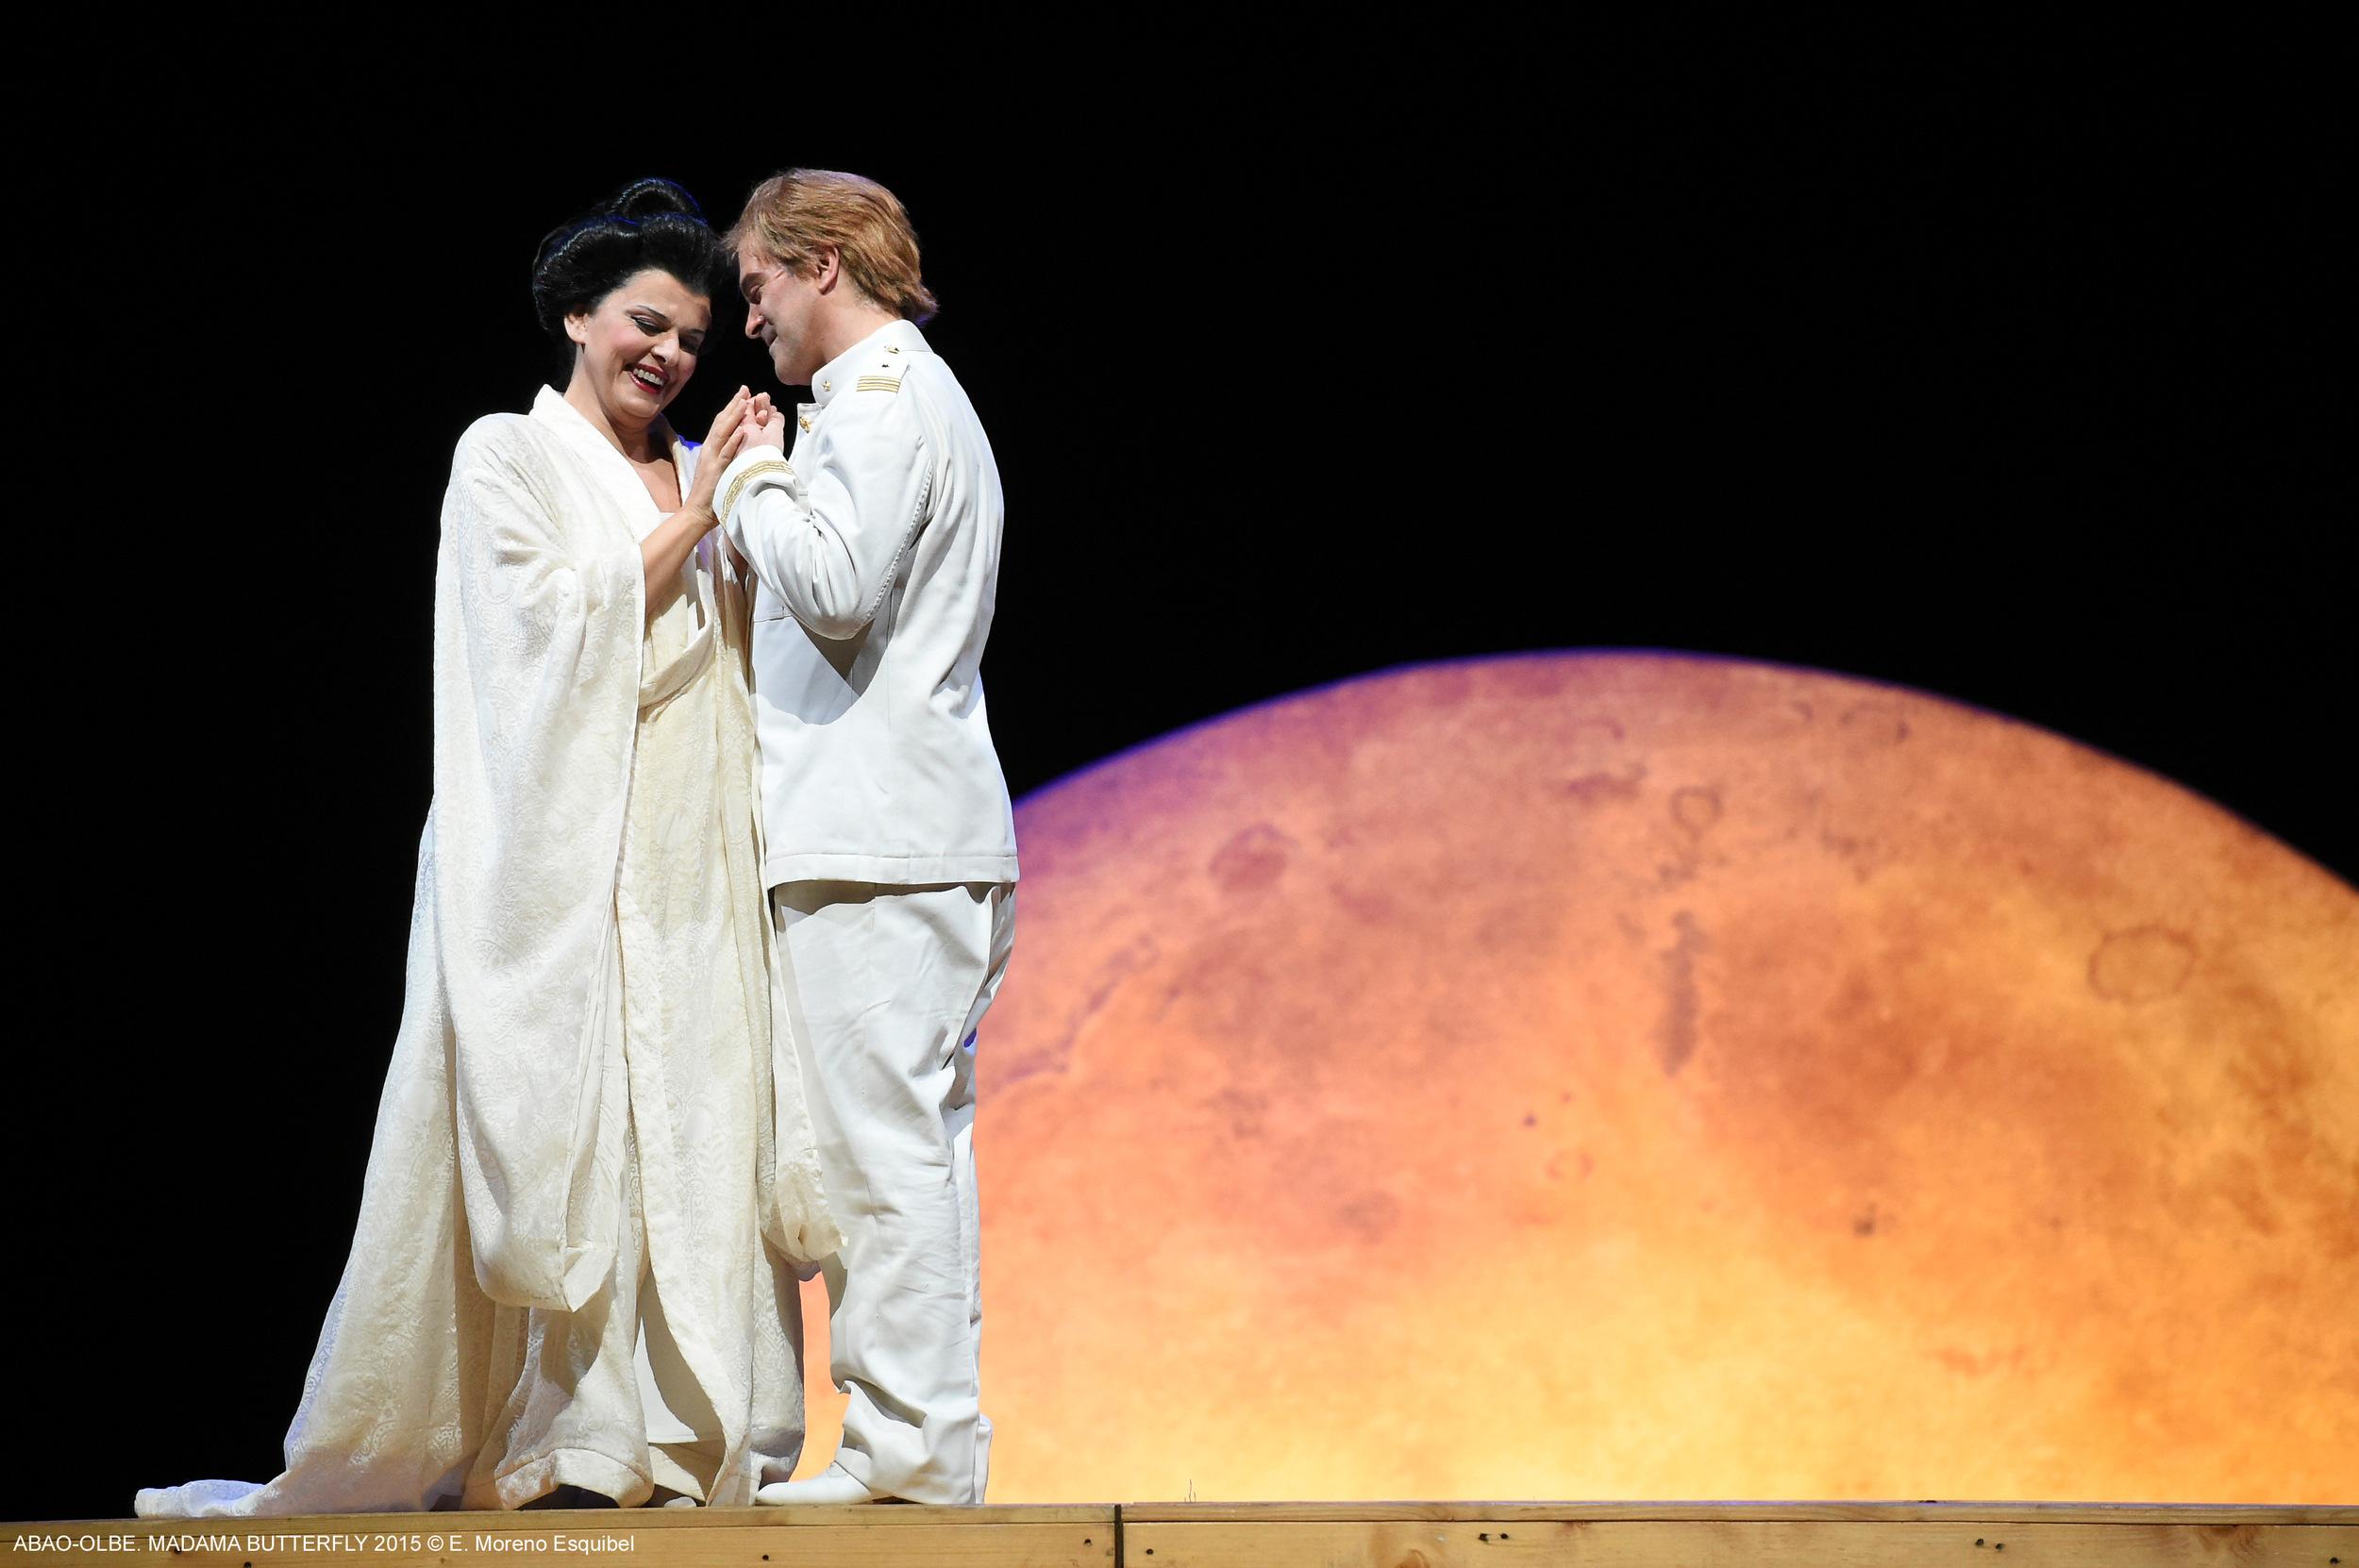 Zarzuela! en El Baluarte: un buen espectáculo, mediocre vocalmente